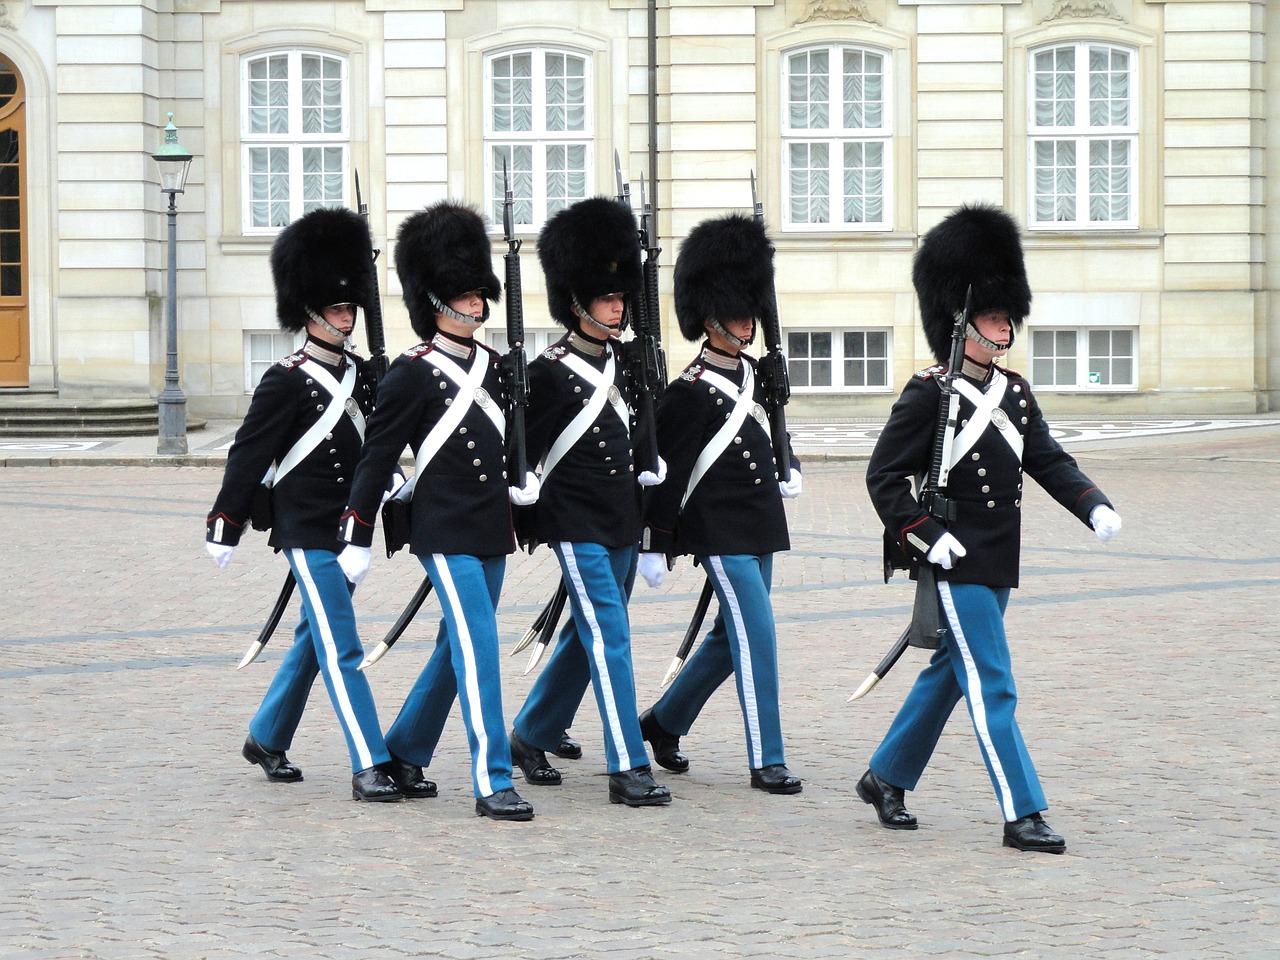 Гвардейцы возле дворца Амалиенборг